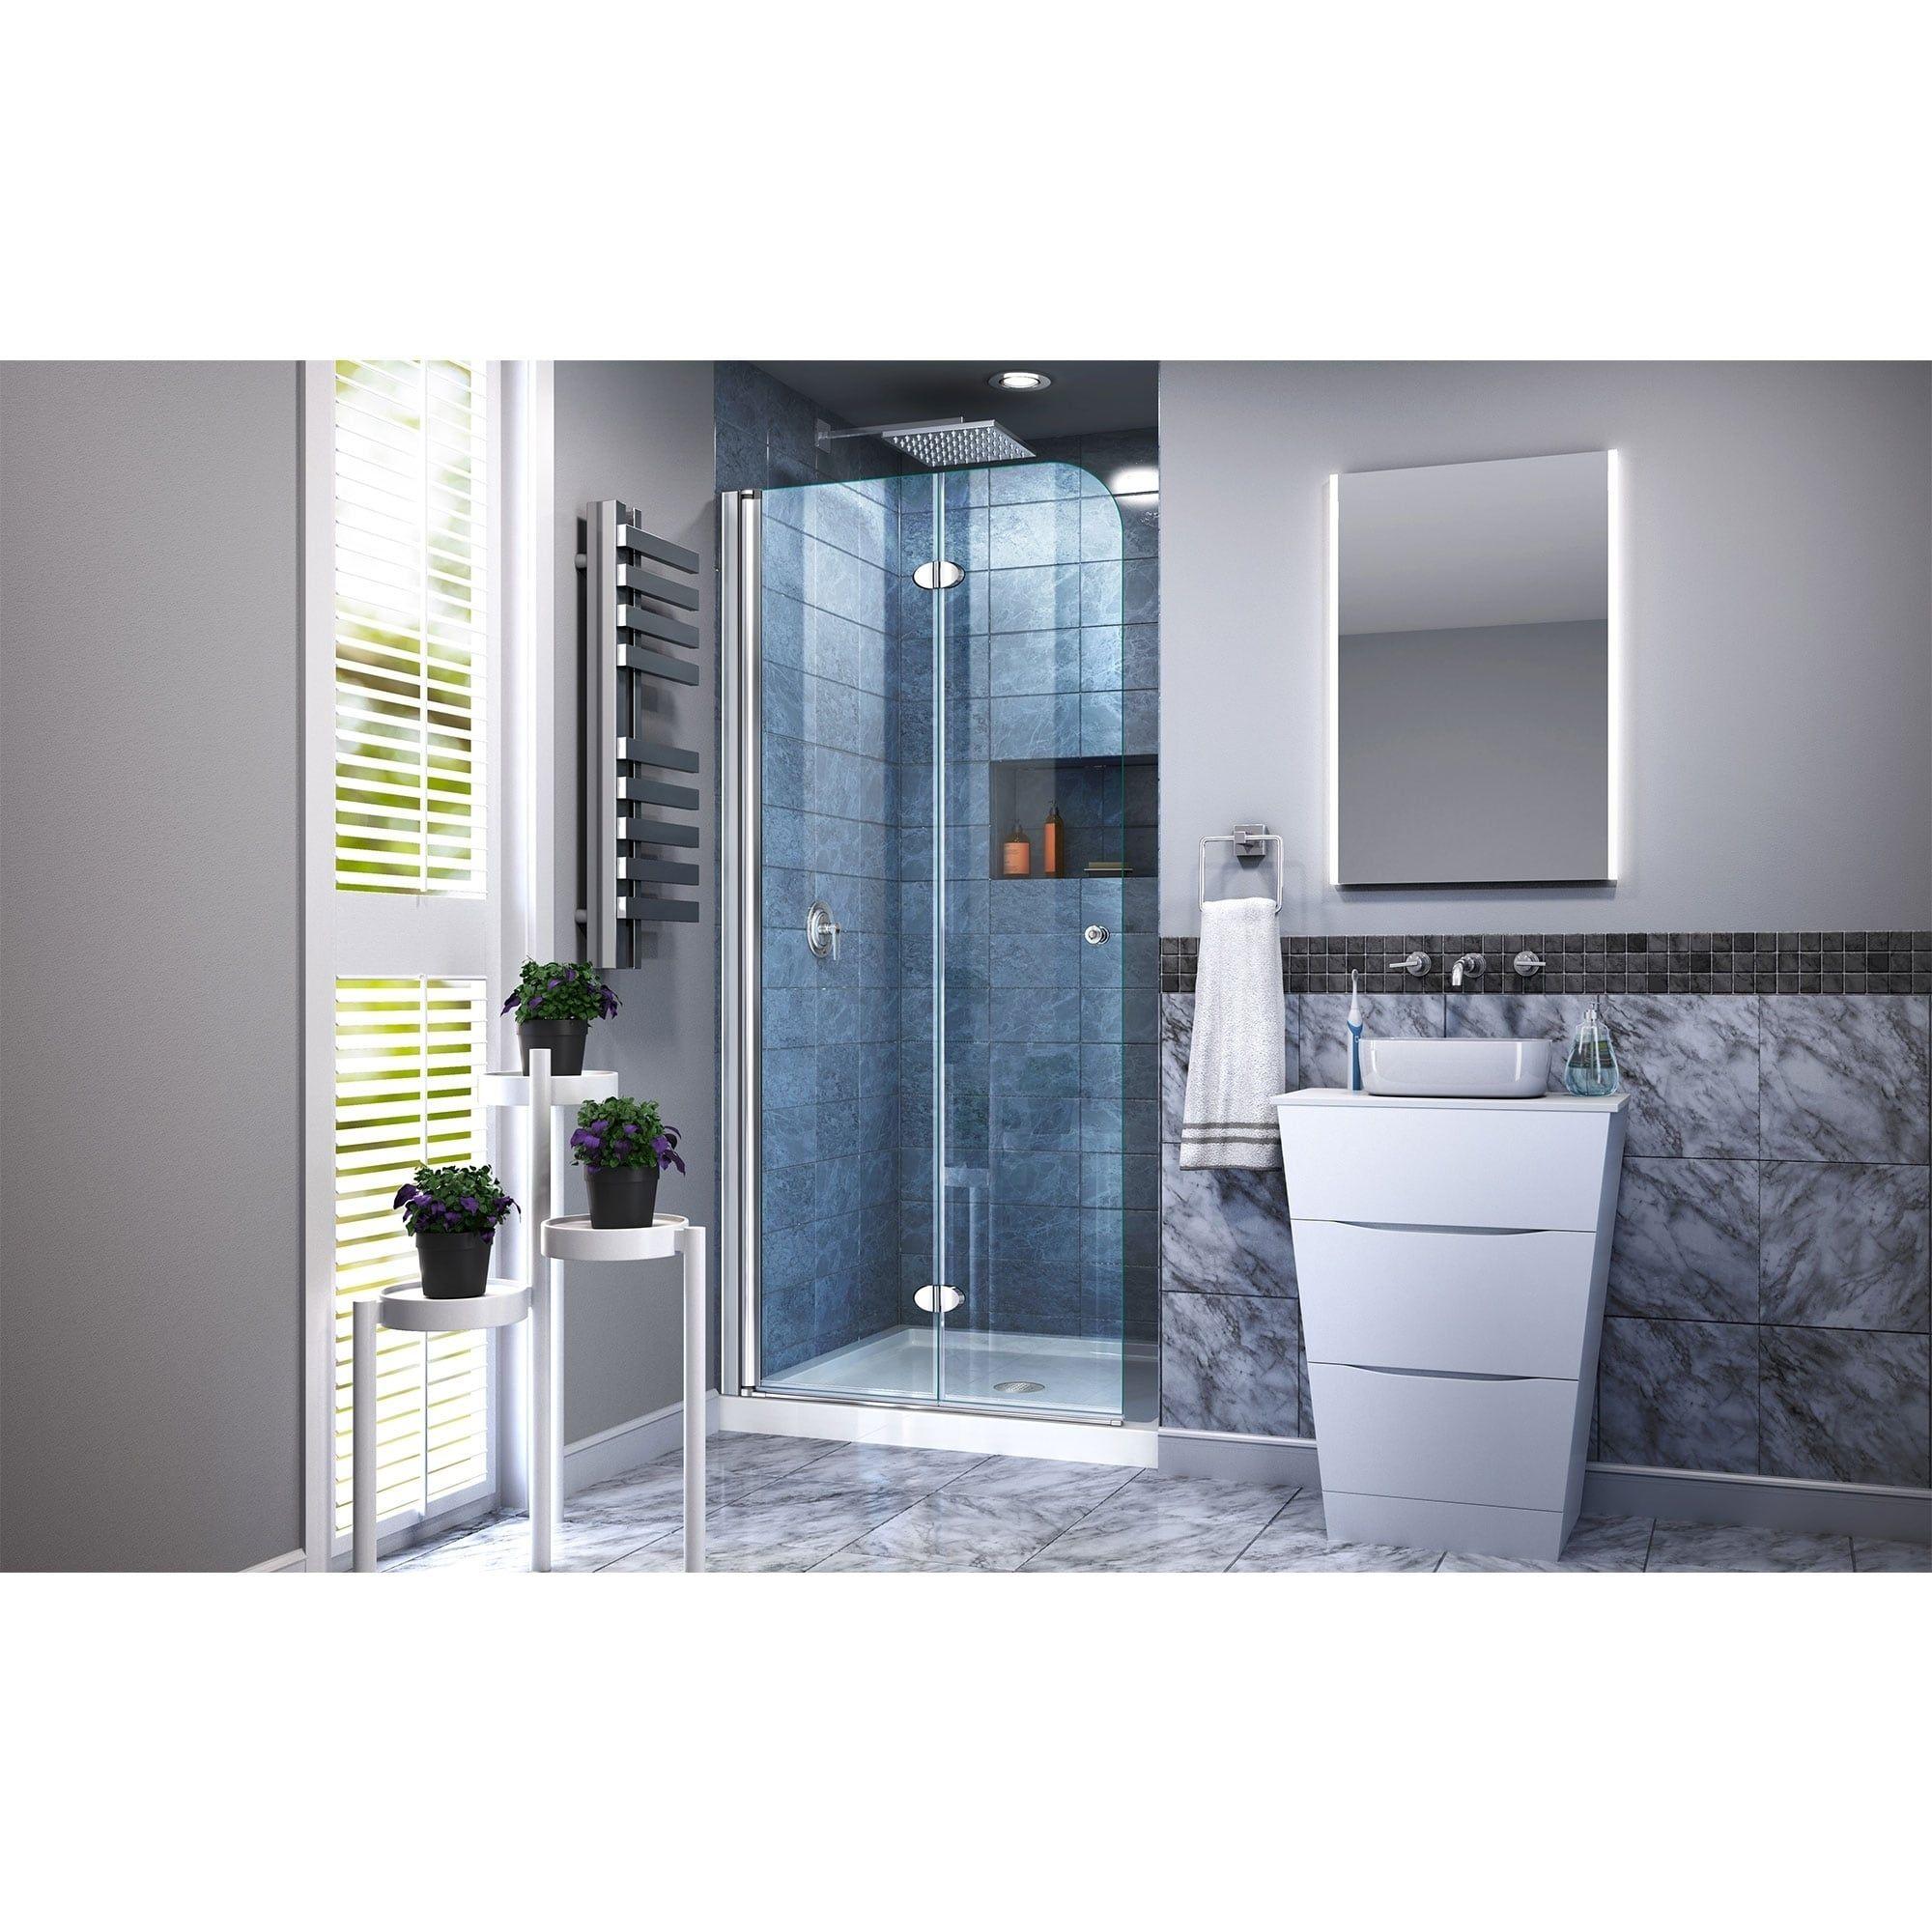 Overstock Com Online Shopping Bedding Furniture Electronics Jewelry Clothing More Shower Doors Semi Frameless Shower Doors Dreamline